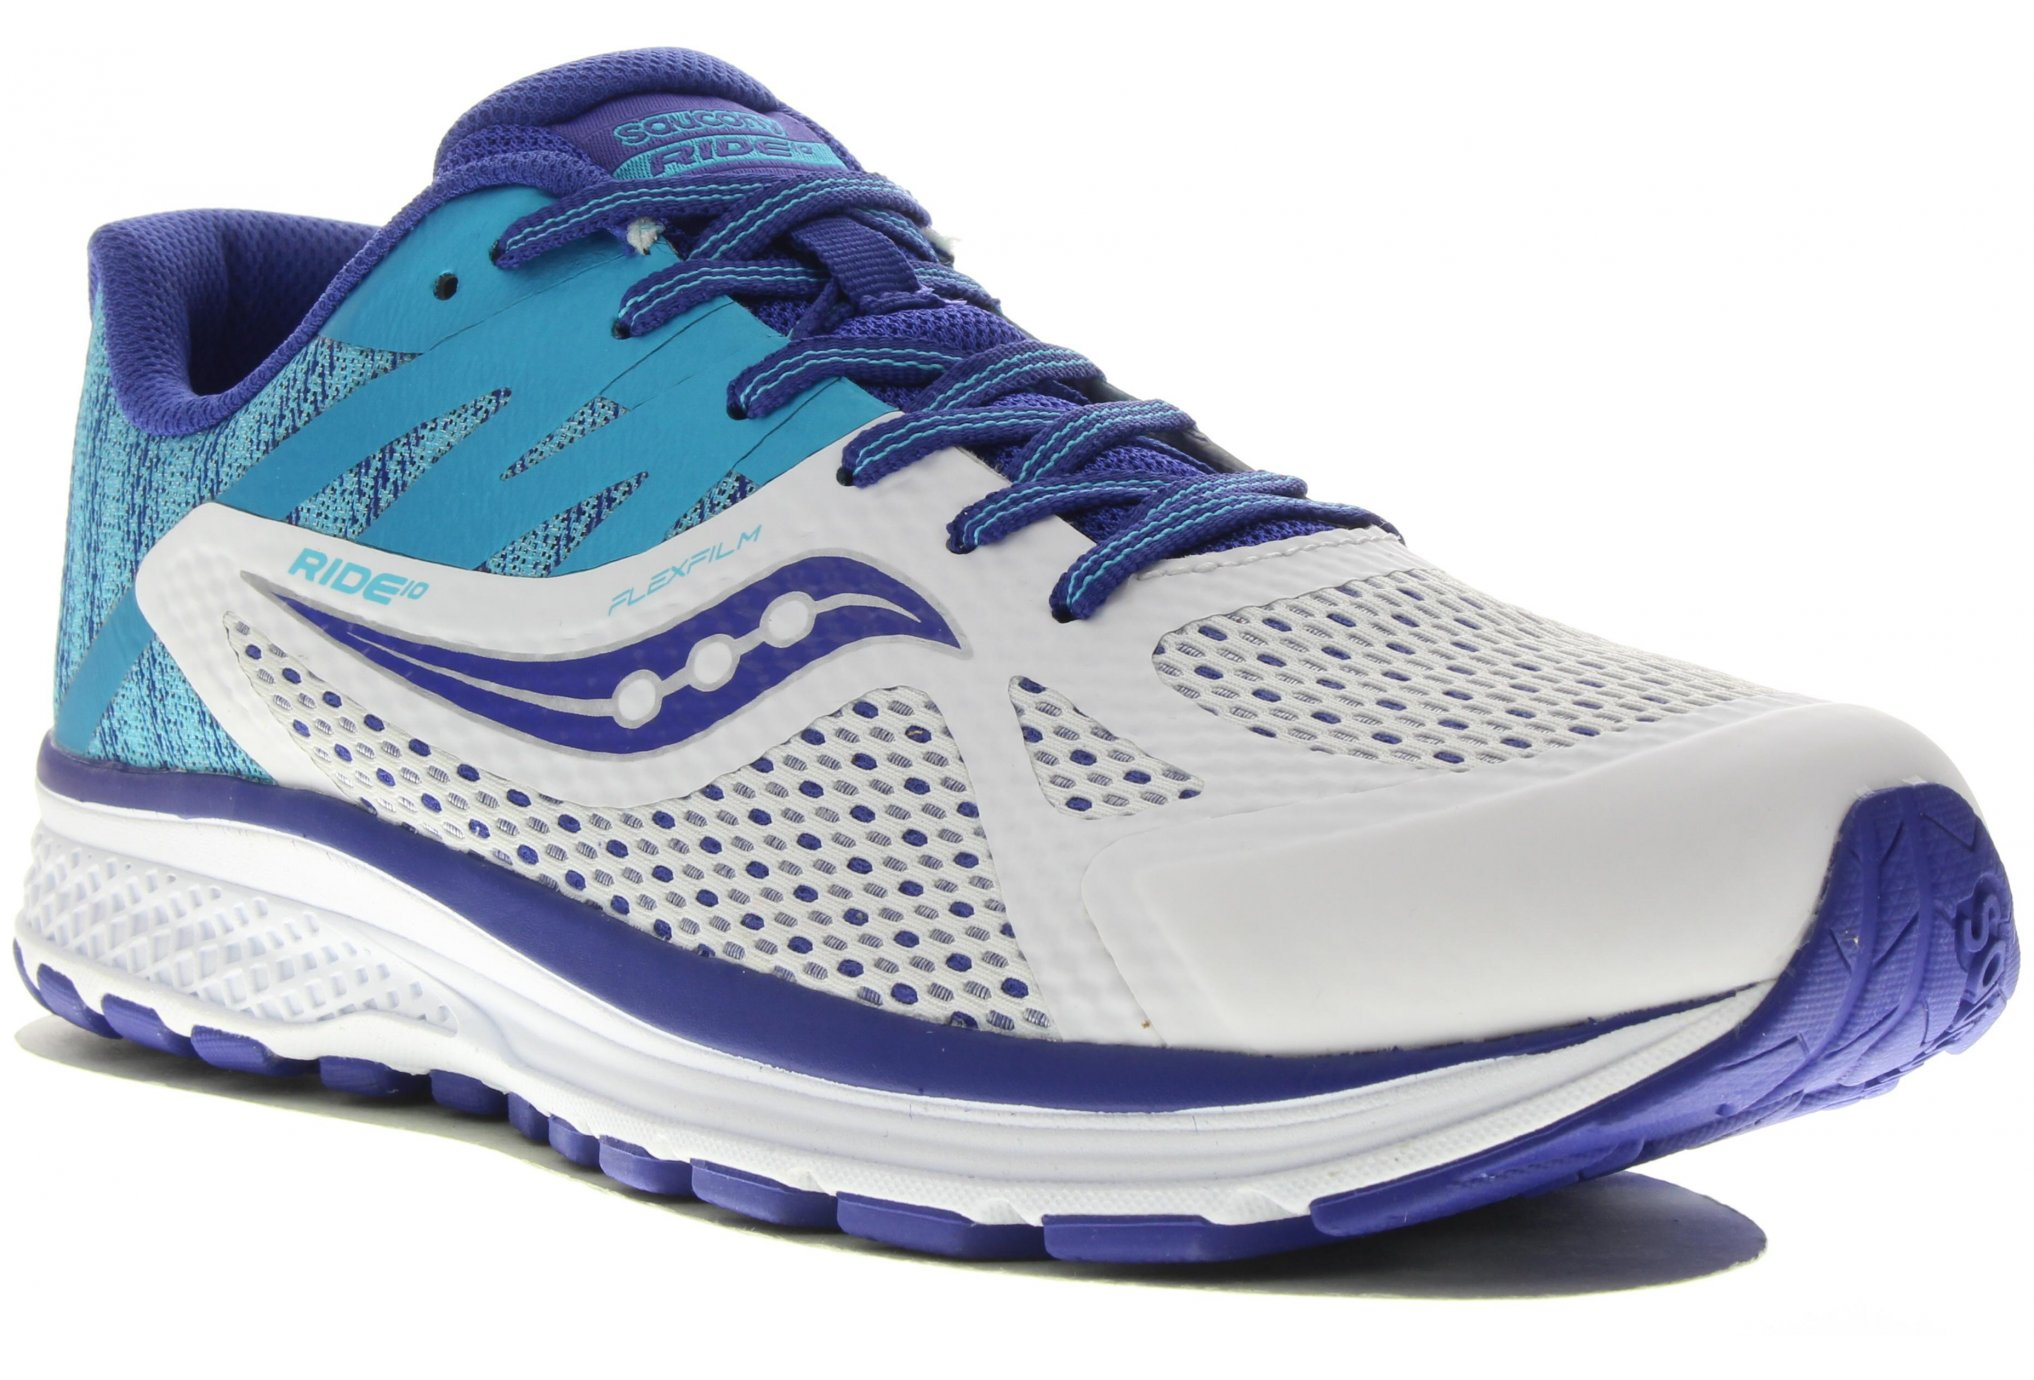 Progrid 6 Bleu R Saucony Chaussures Ride 4RqcSAjL53